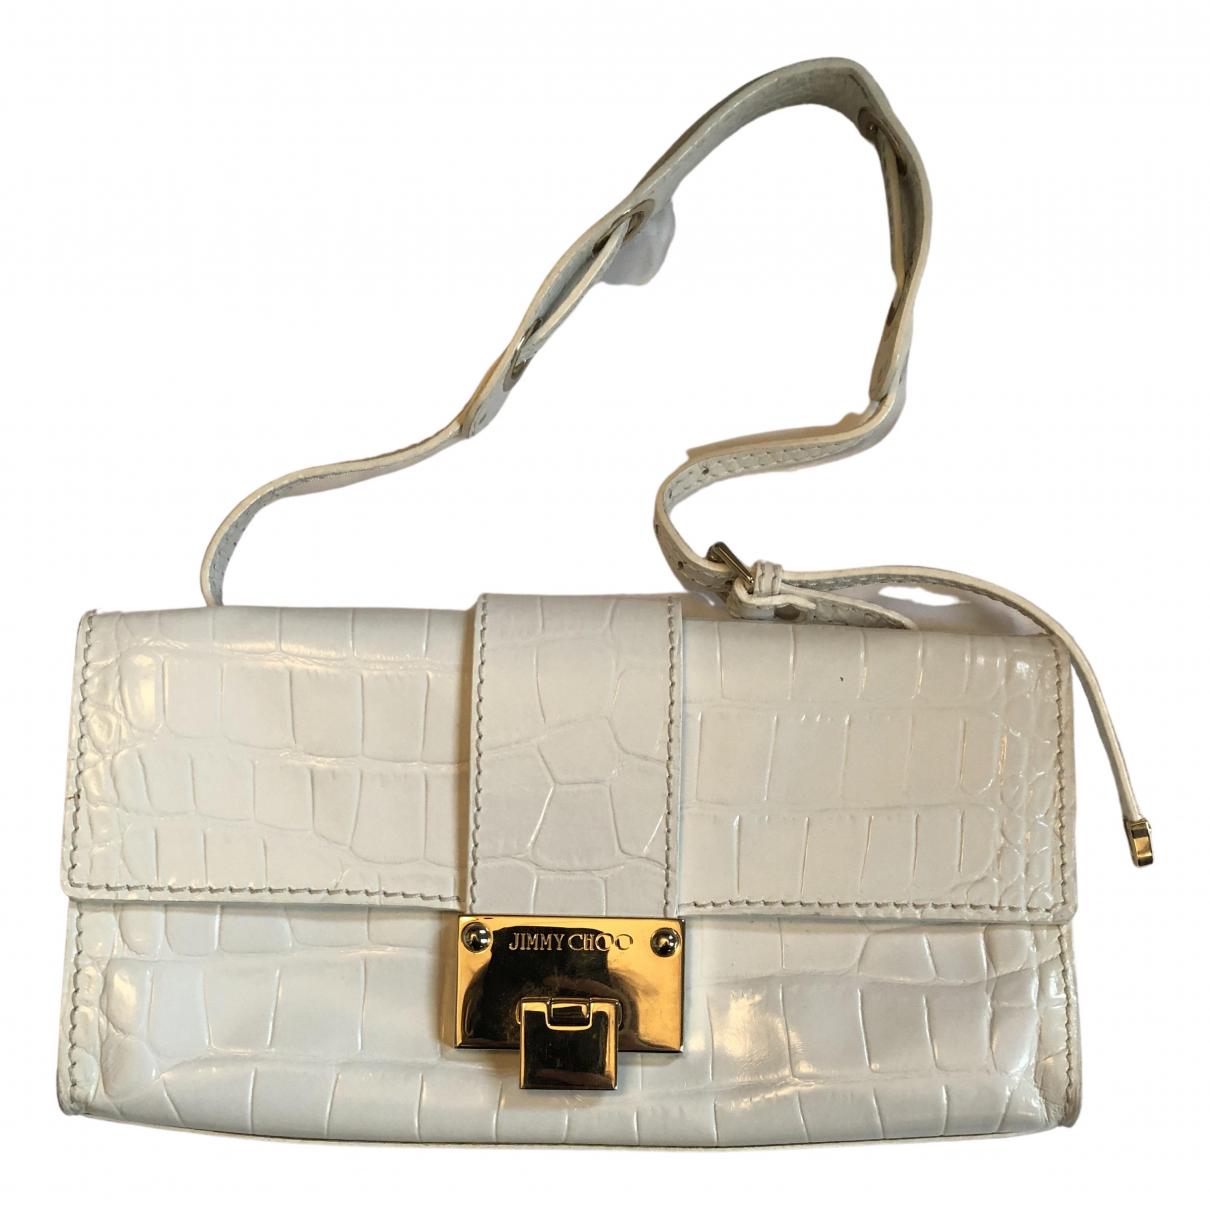 Jimmy Choo N White Patent leather handbag for Women N